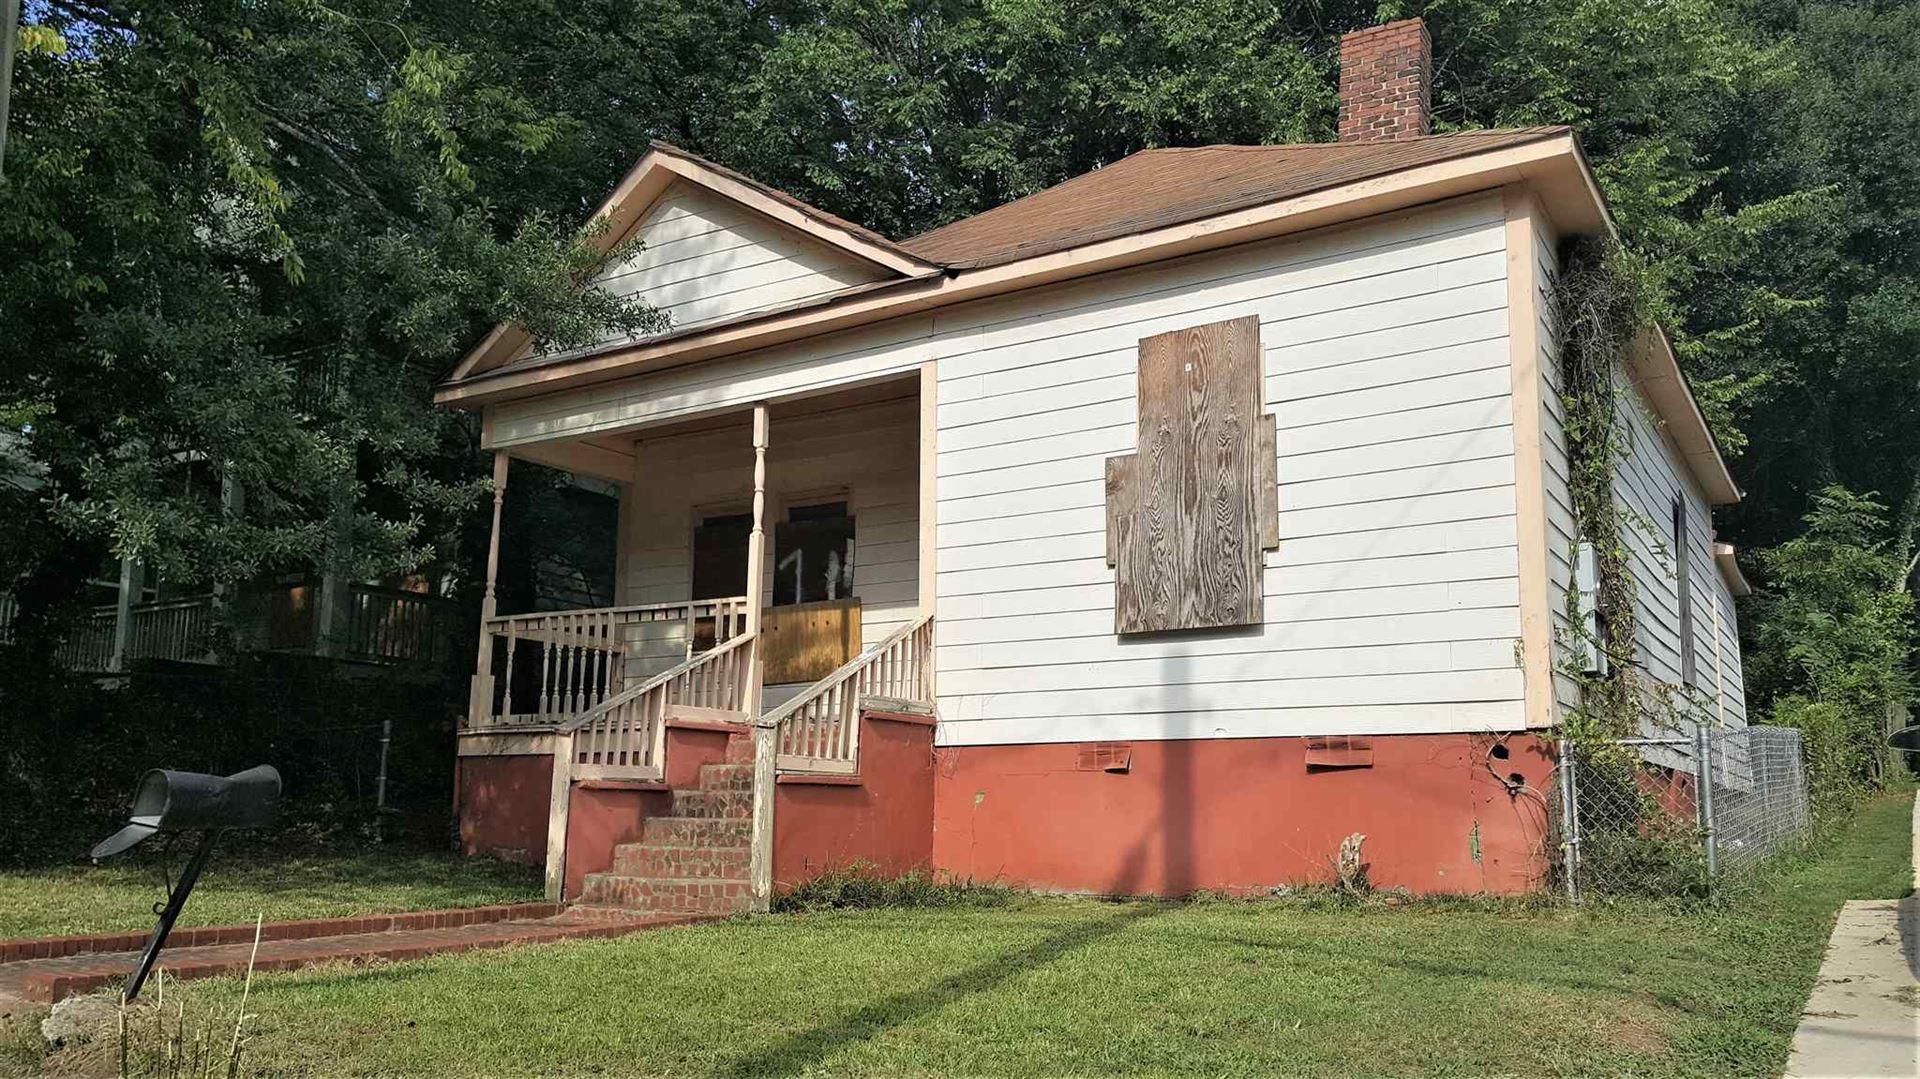 401 Andrew J Hairston Pl, Atlanta, GA 30314 - MLS#: 8841938